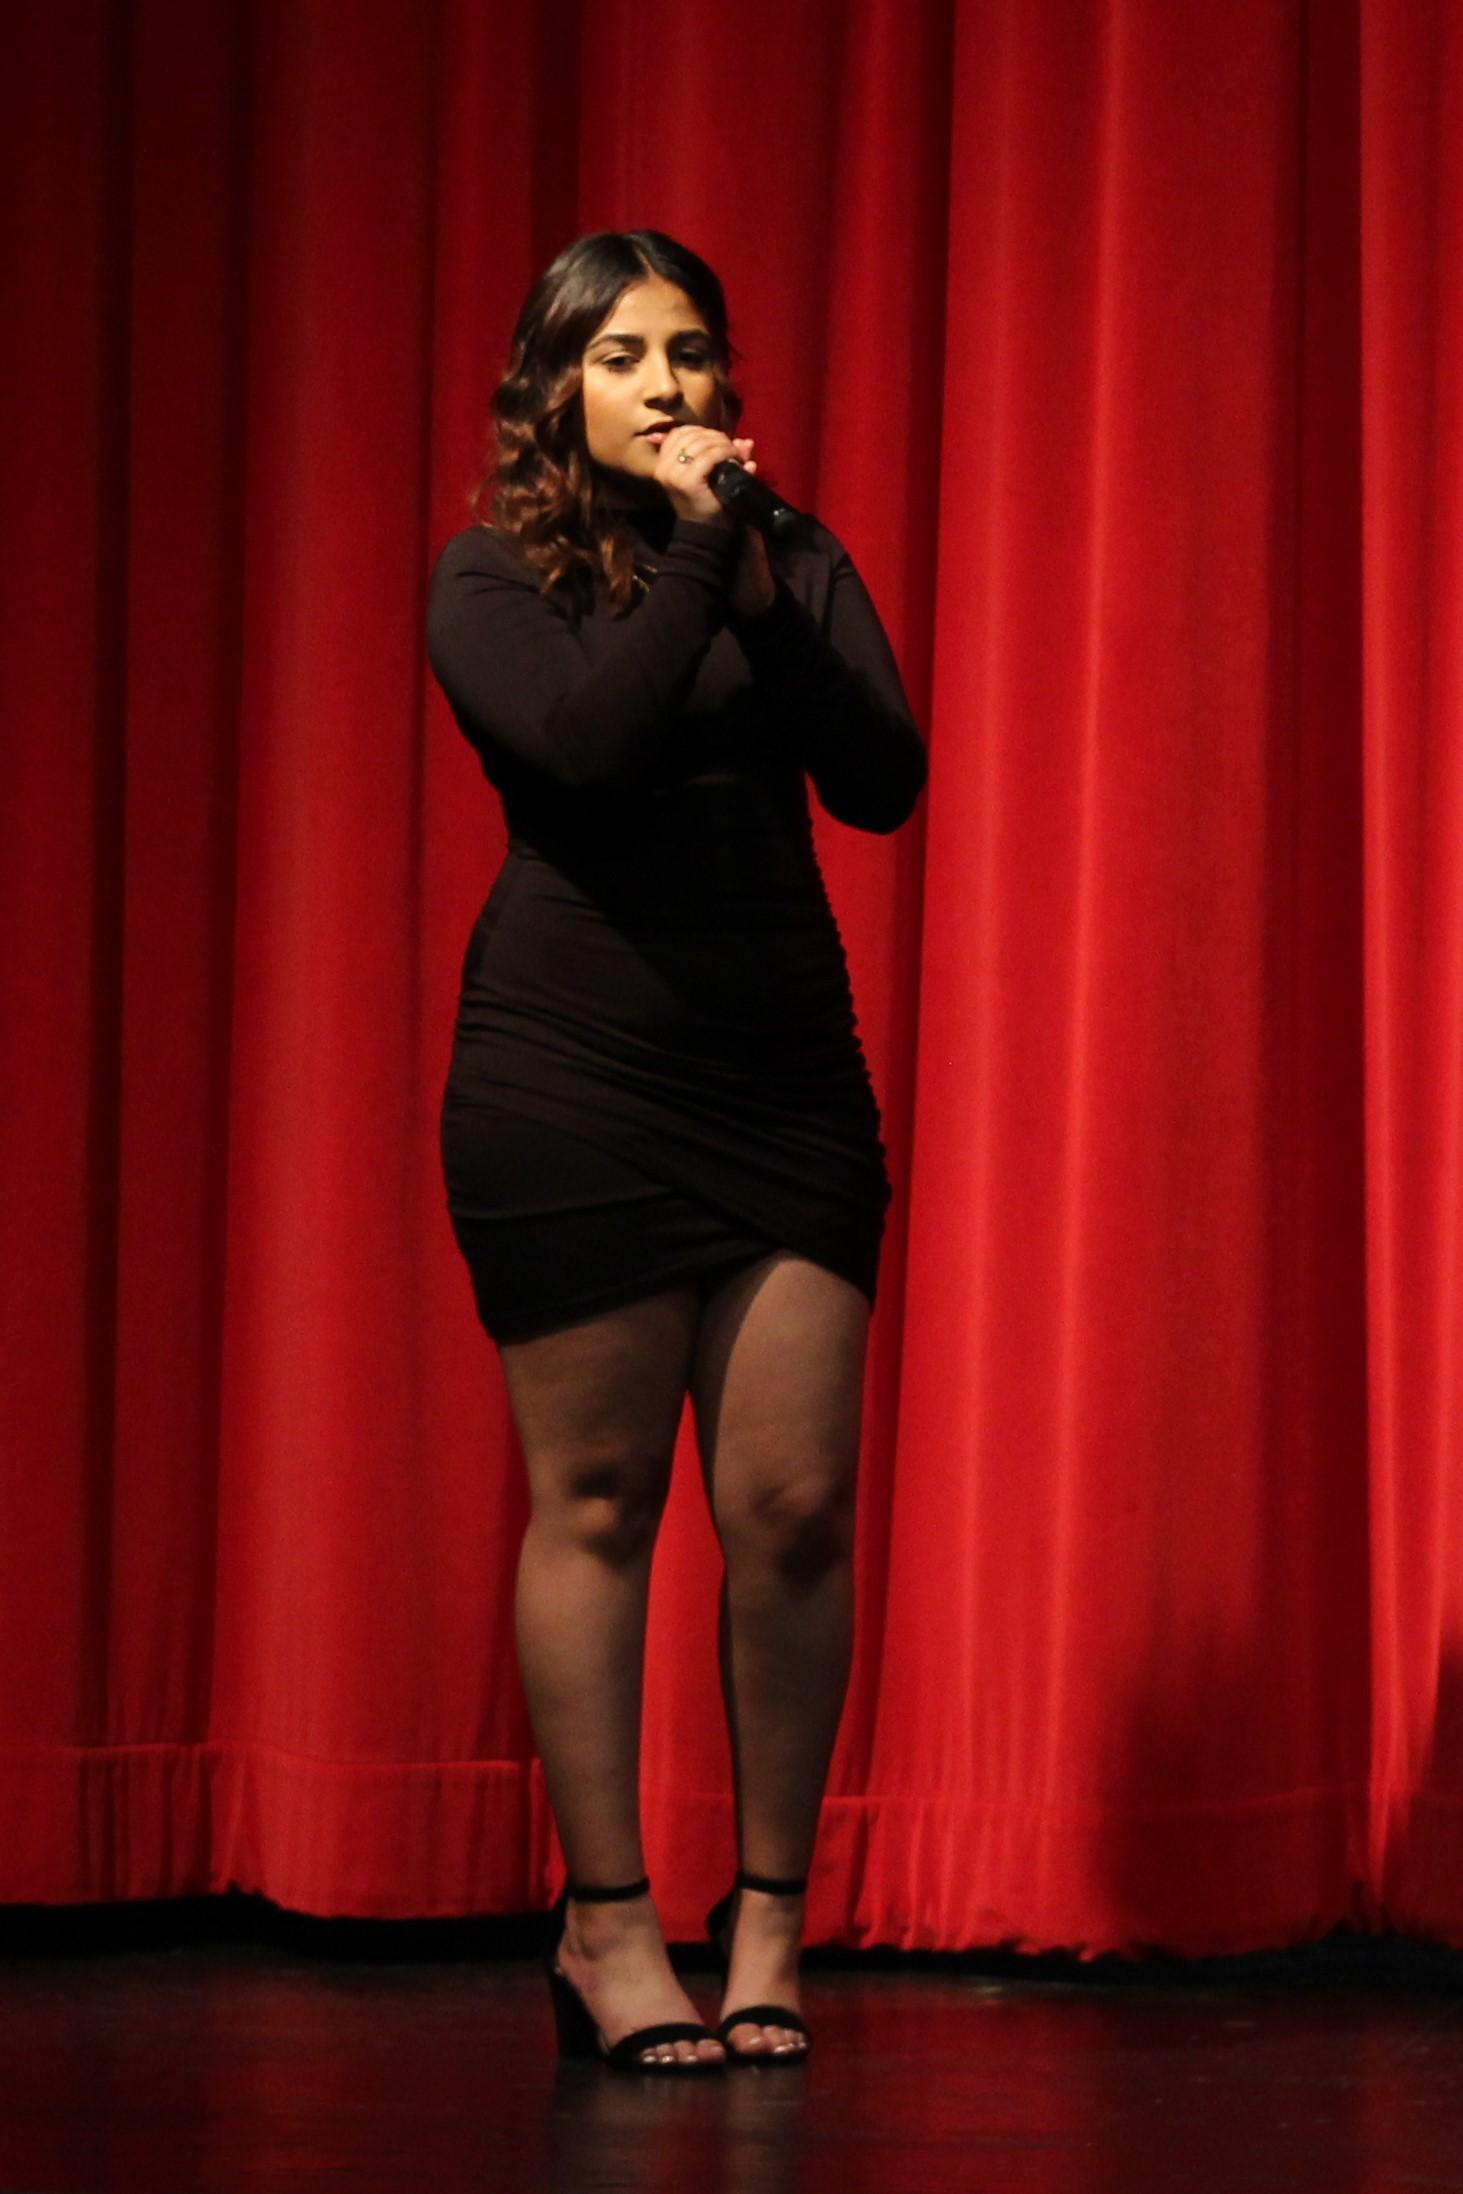 Jennifer Tapia-Martinez singing at the talent show